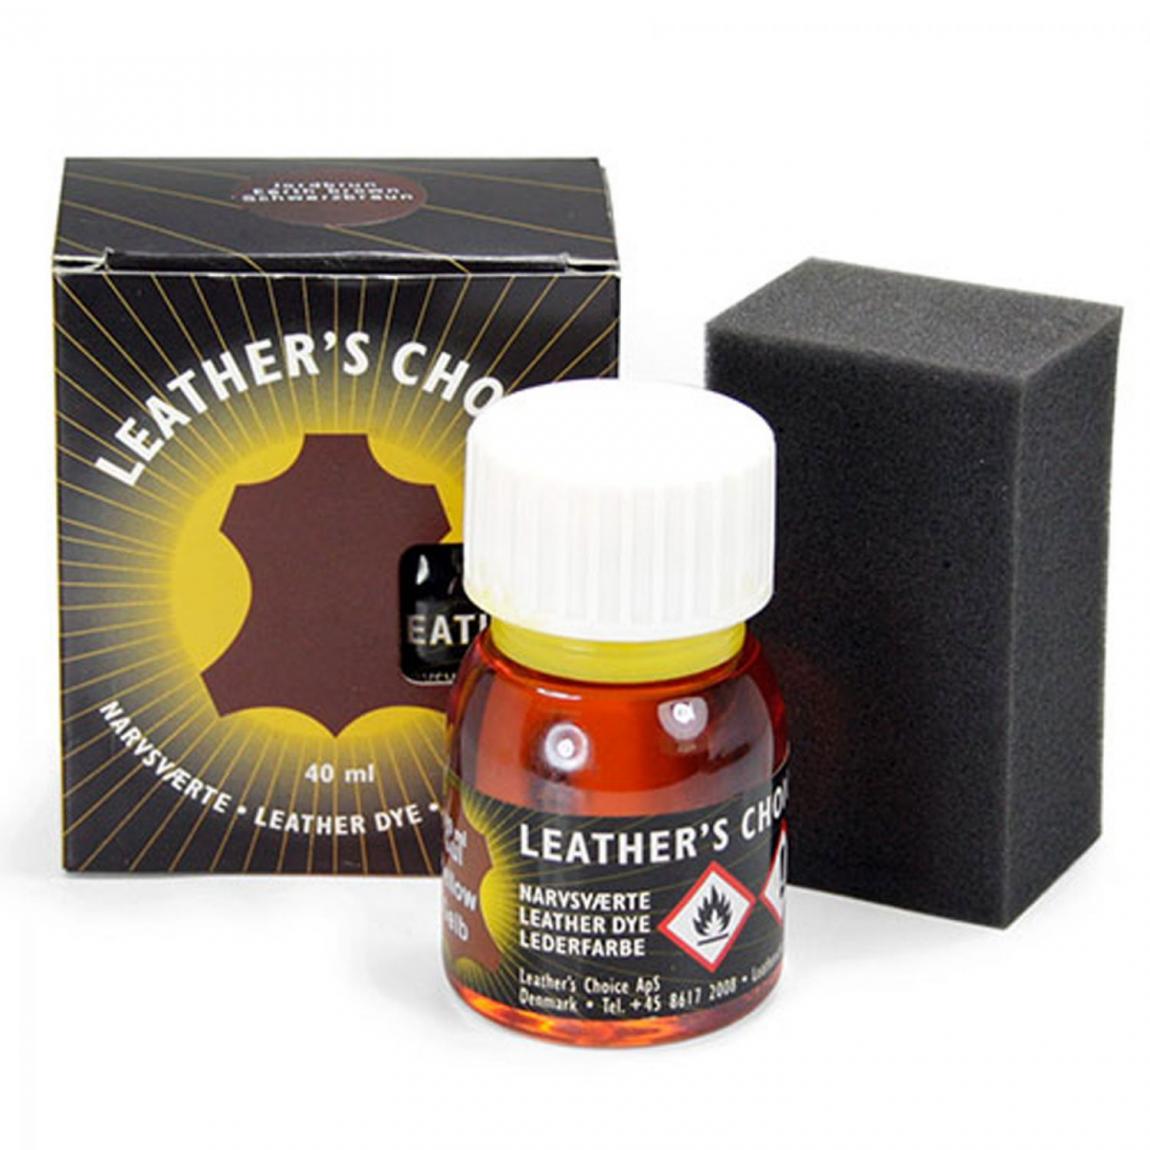 Spezialbeize Leathers Choice - Tan (ocker), 40 ml